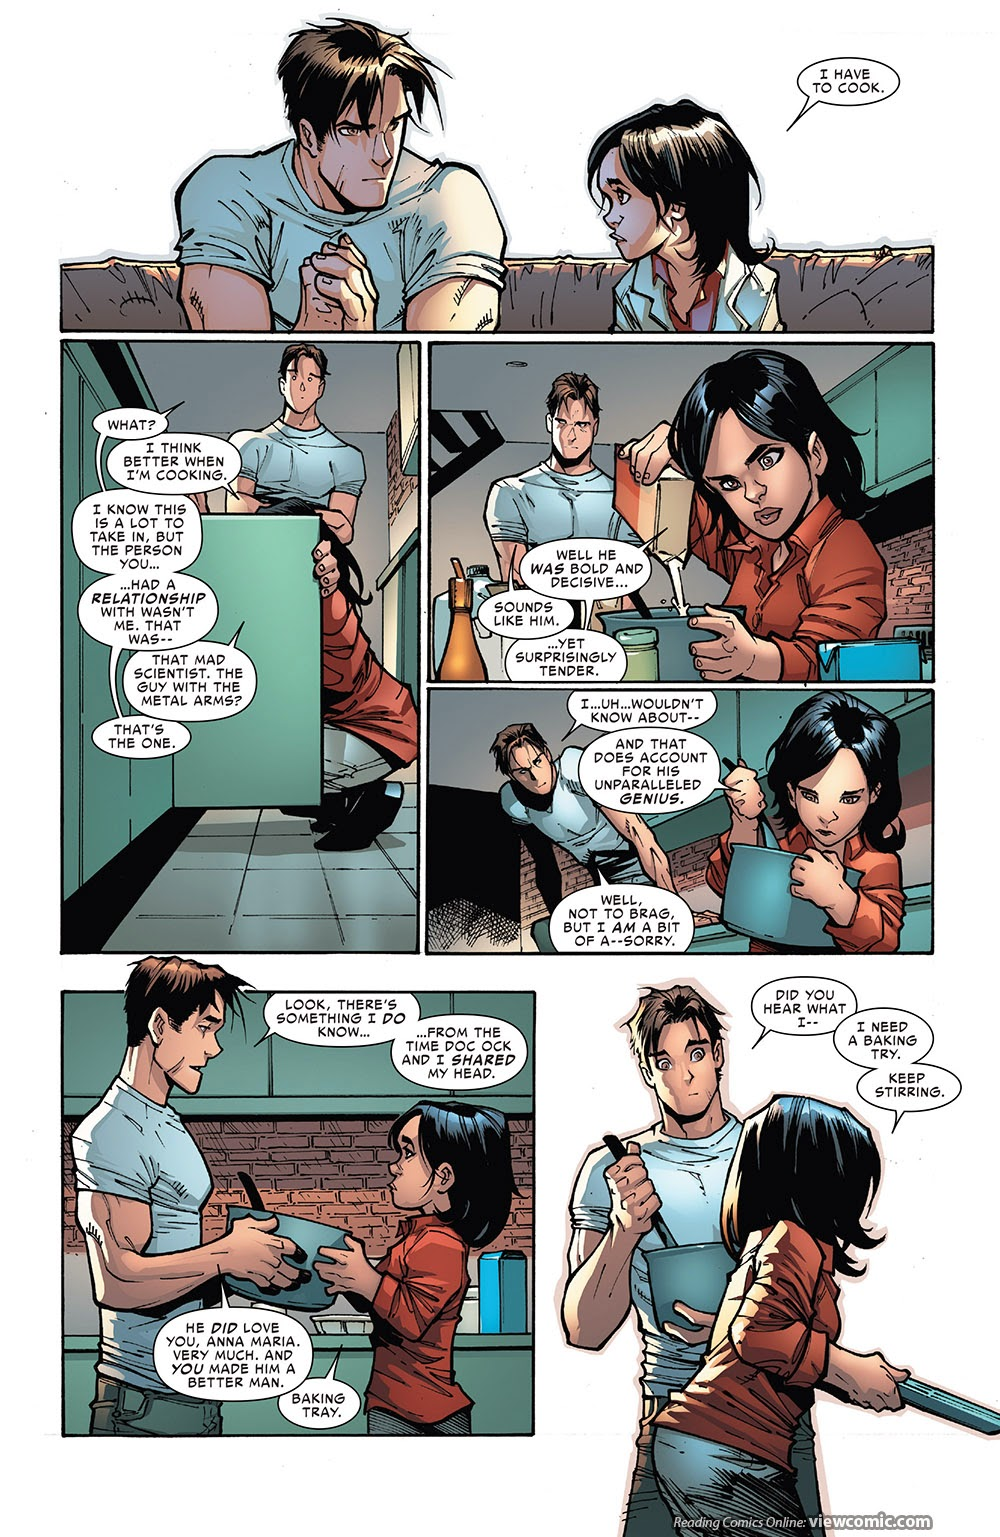 Amazing spider man v3 002 2014 vietcomic net reading comics online